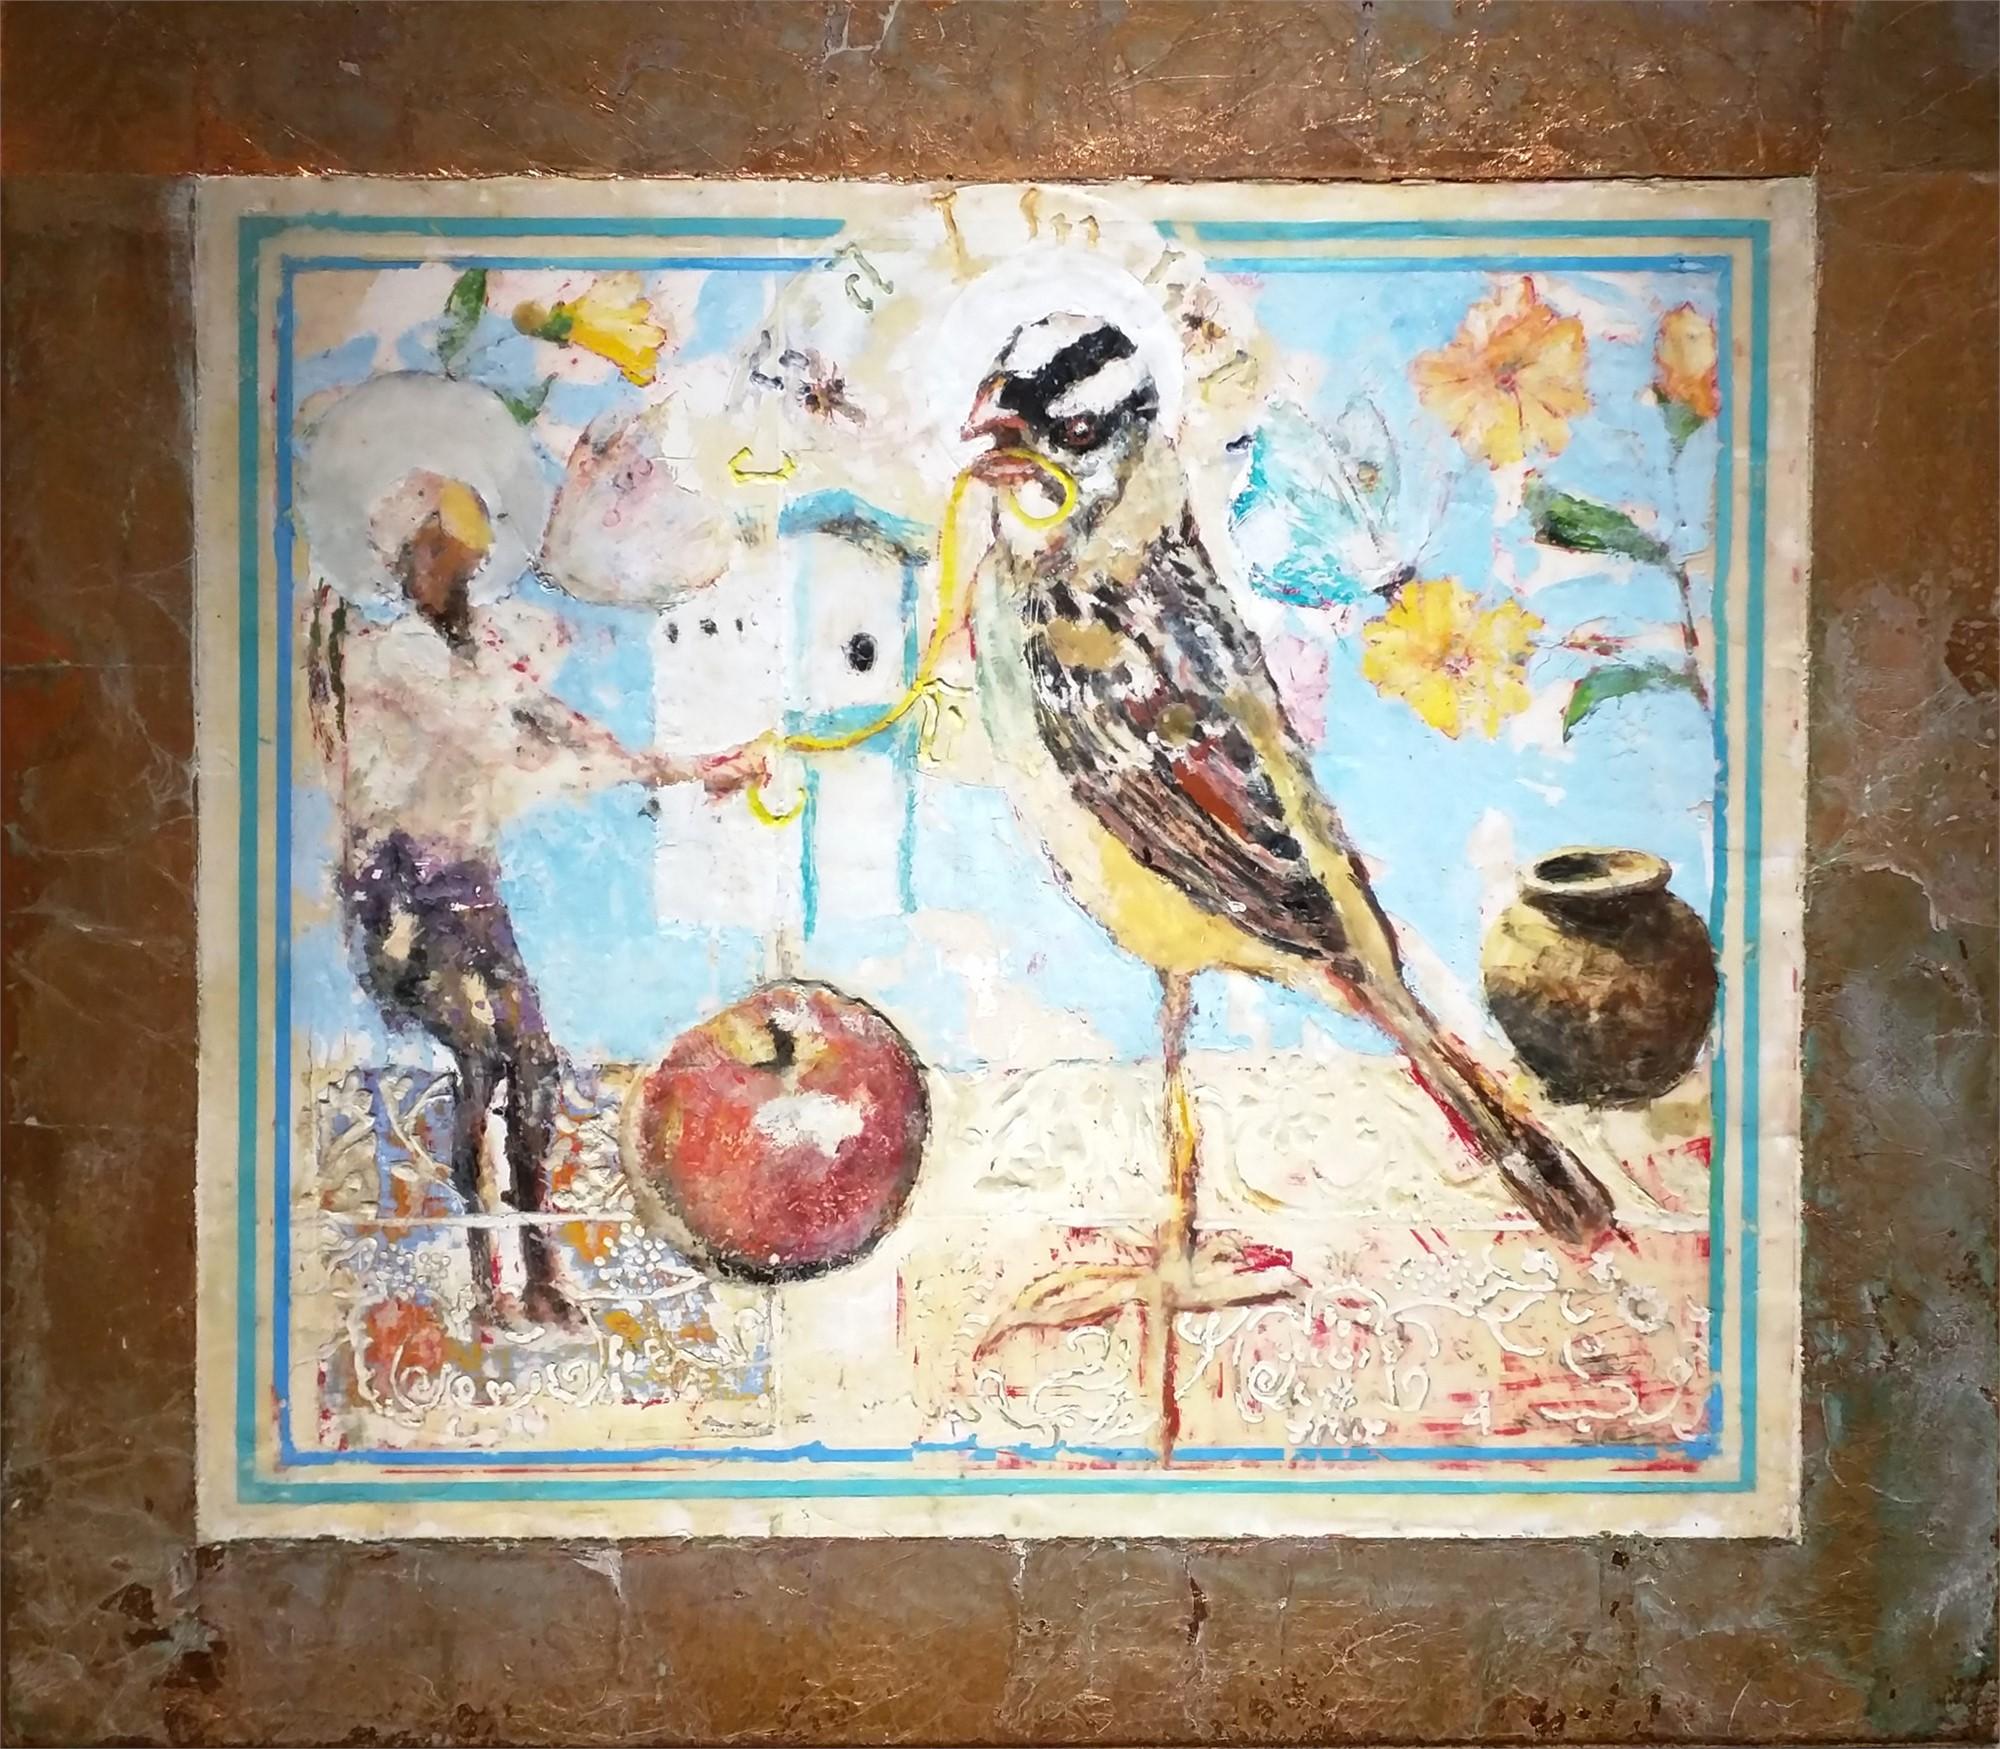 Still Life for Bird Temple #5 by Mark Gaskin